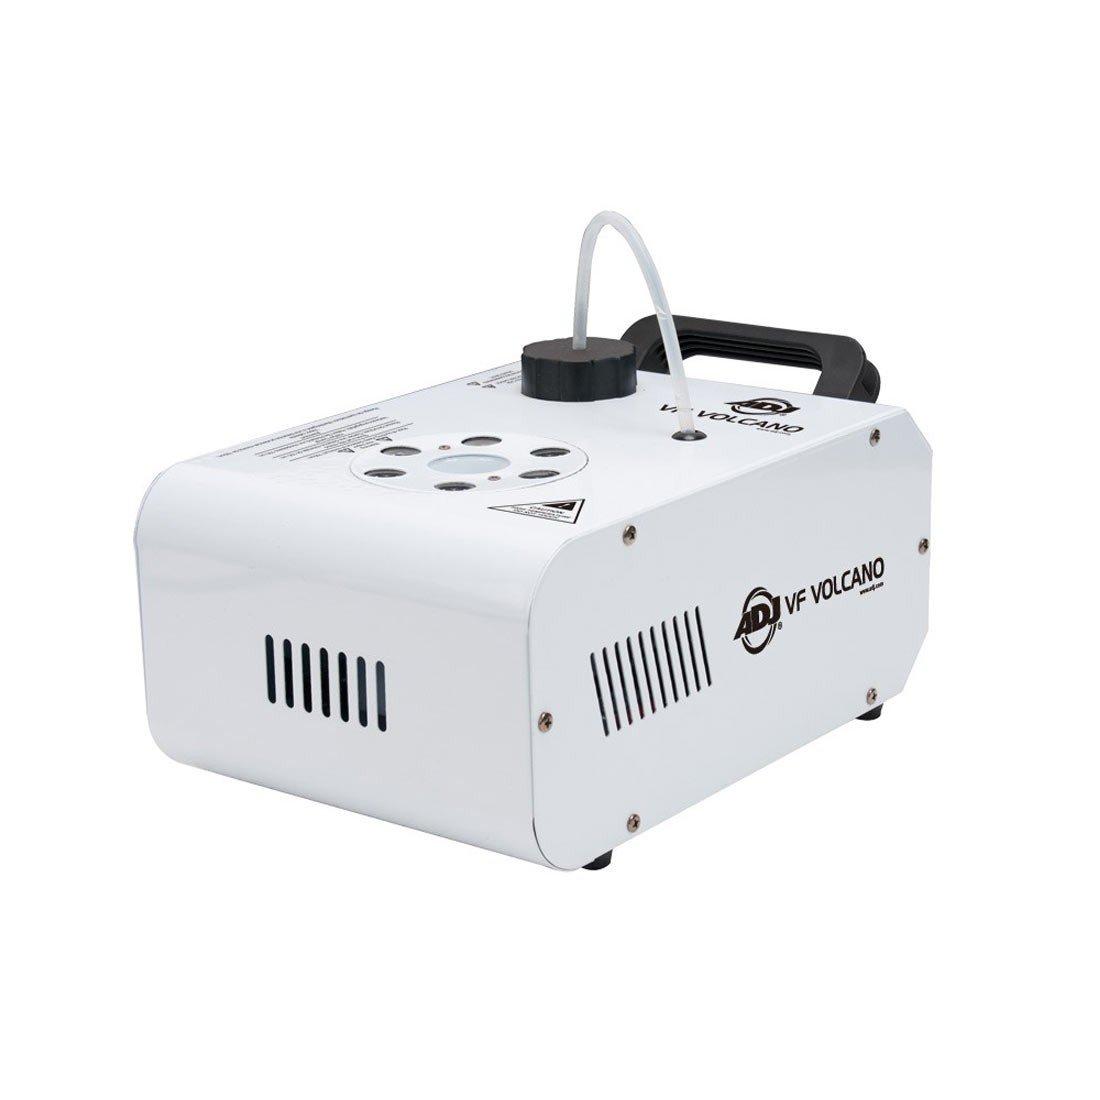 ADJ Products VF VOLCANO FOG mach w/ 6x 3-Watt RGB LED